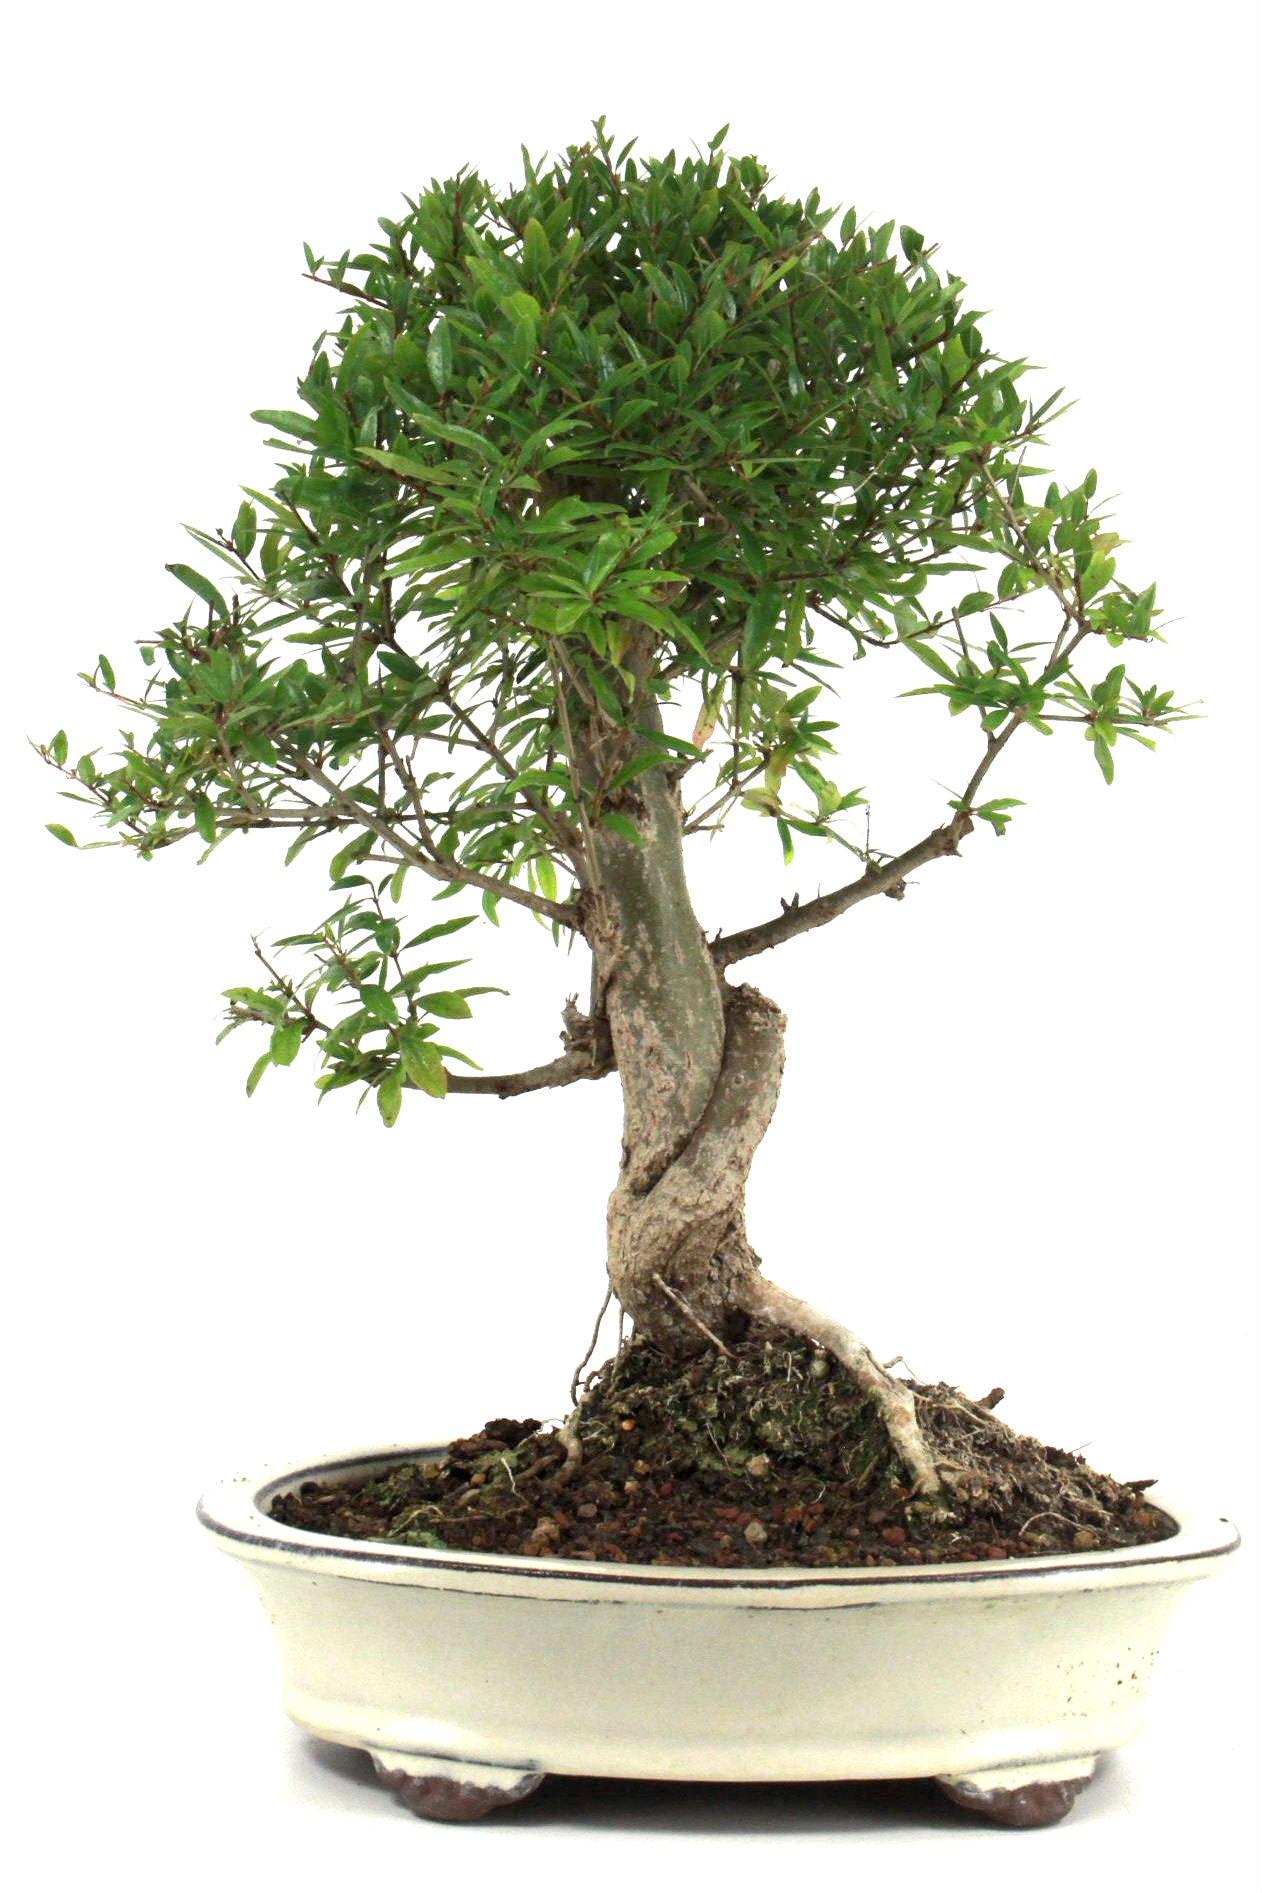 granatapfel bonsai 40 45 cm 259 bei oyaki bonsai kaufen. Black Bedroom Furniture Sets. Home Design Ideas